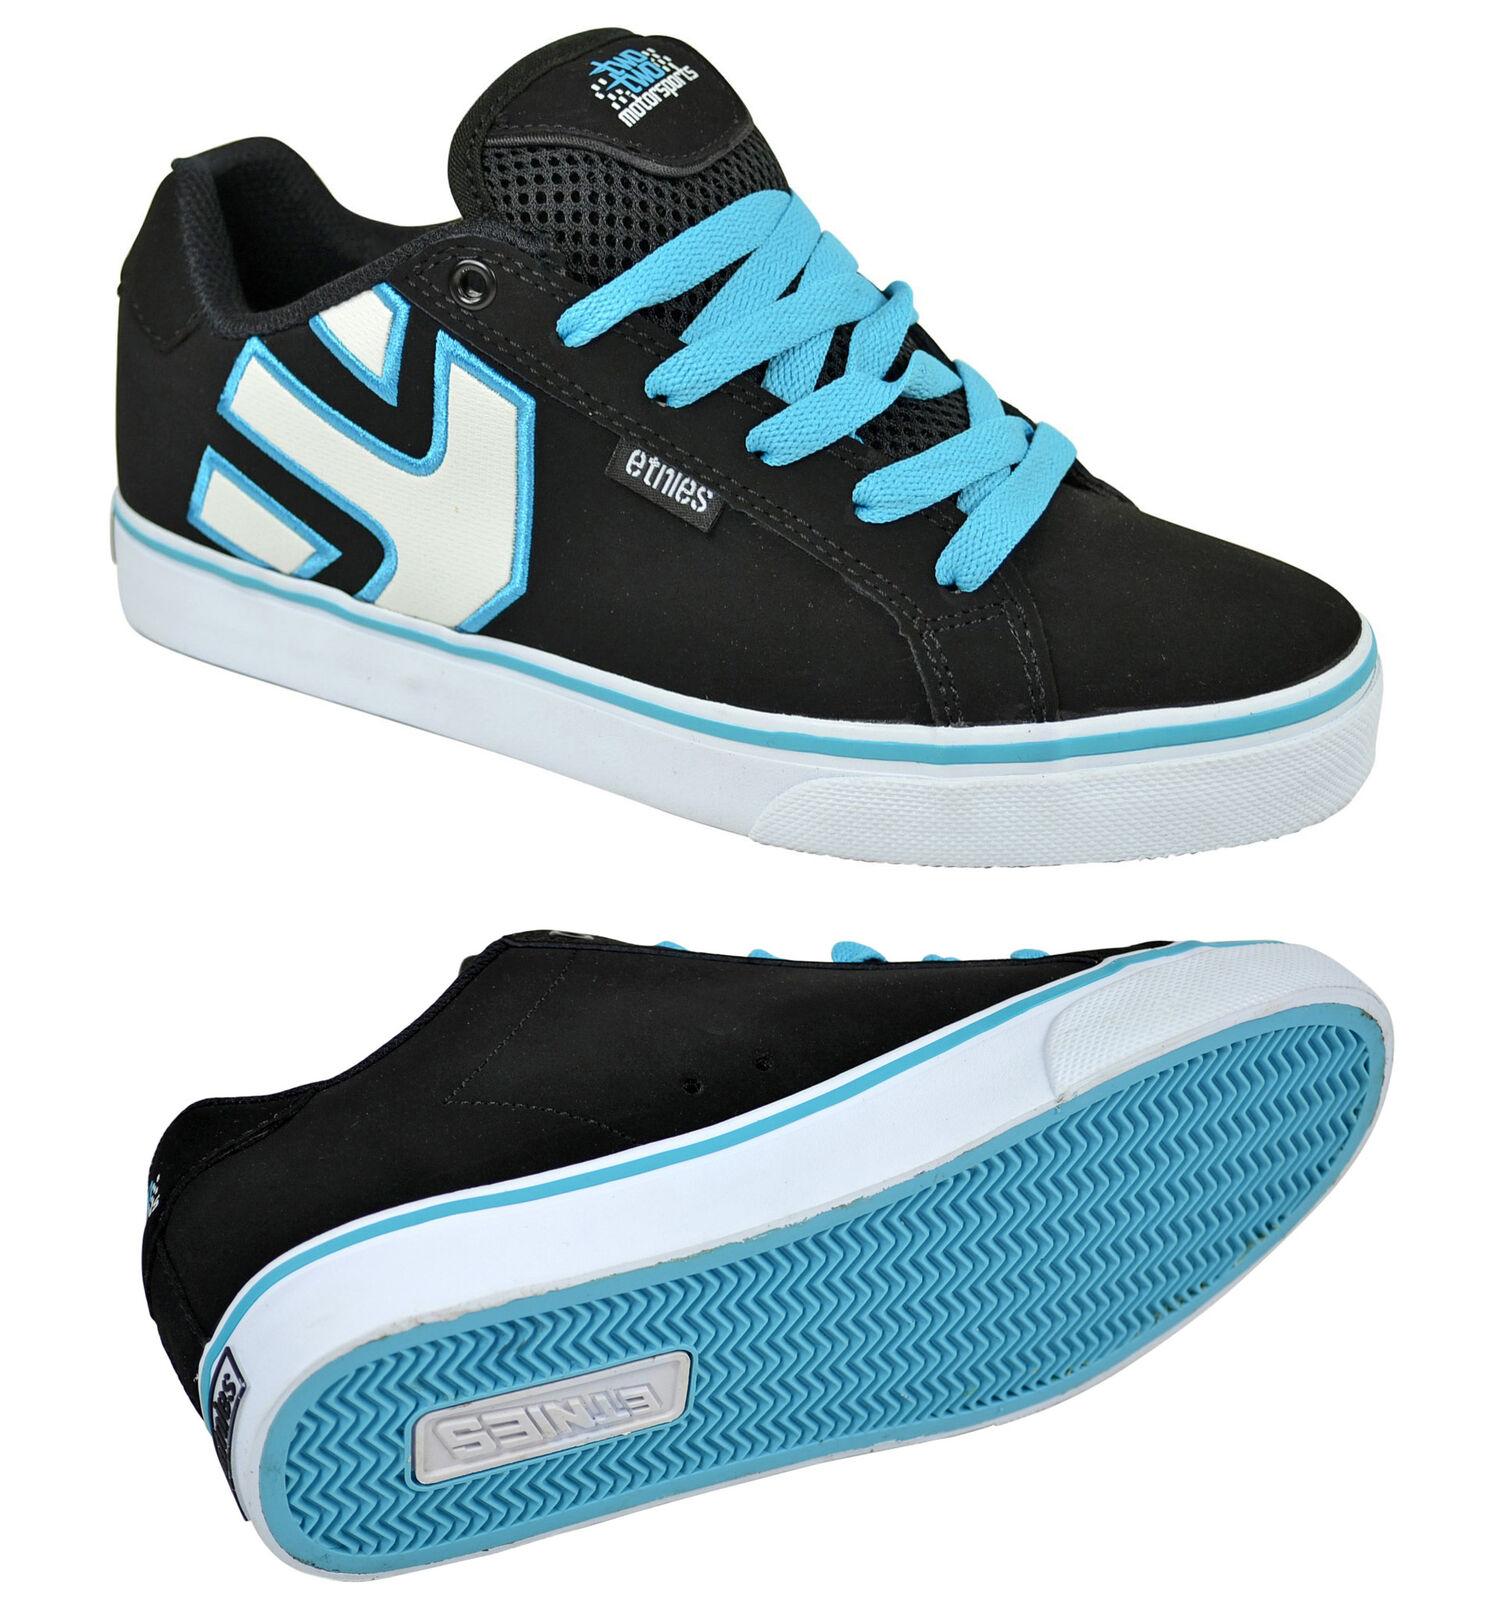 Etnies Chad Reed Fader Vulc schwarz Blau Blau Blau Skater Schuhe Turnschuhe Größenauswahl 7d2756